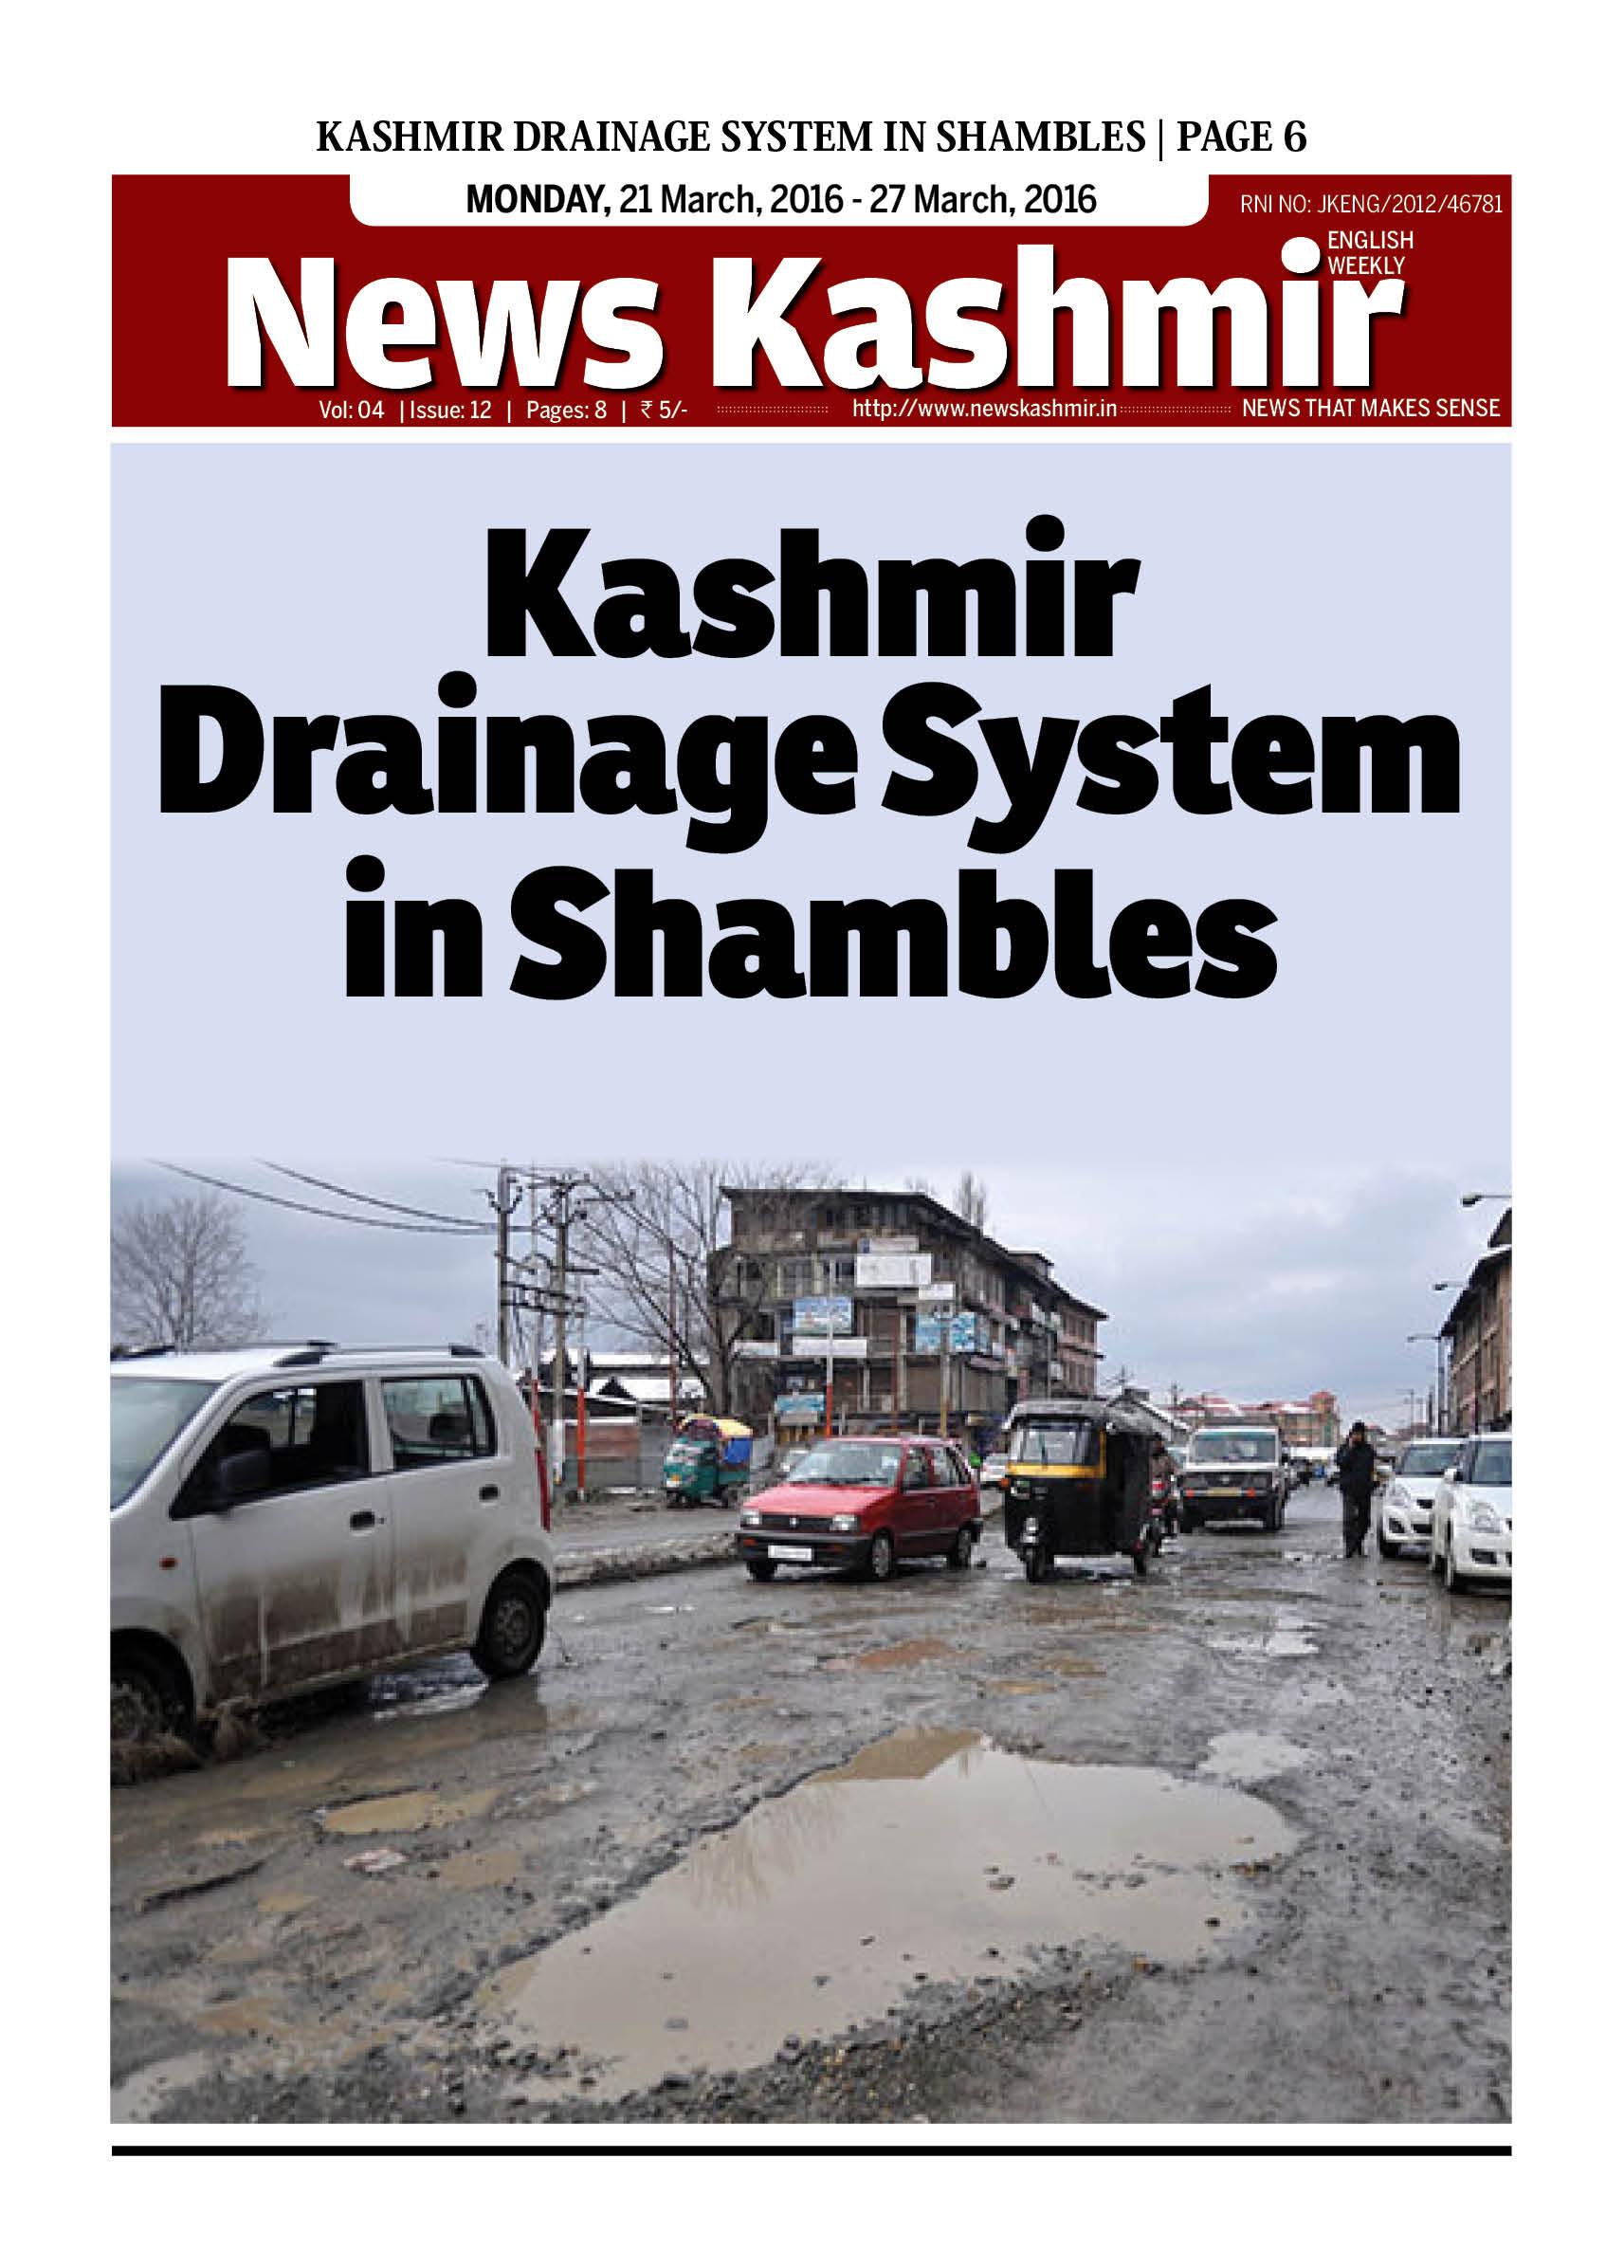 Kashmir Drainage System in Shambles